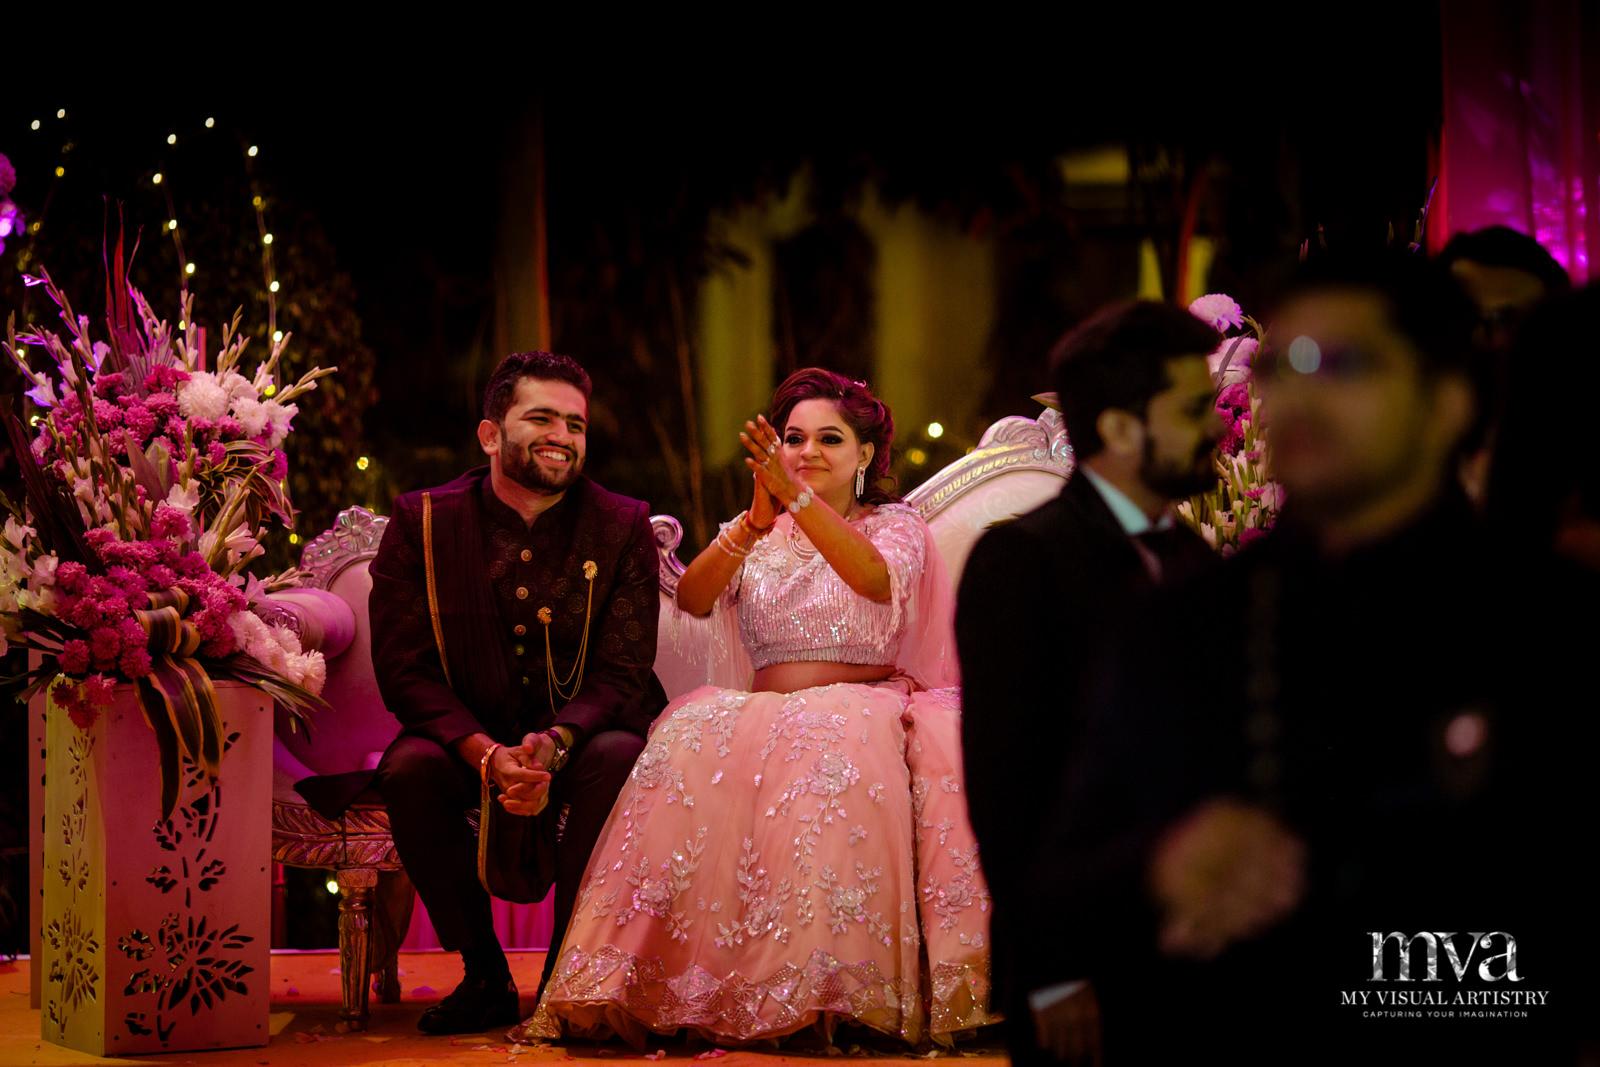 0503 -Vani_Sarang_ Photographer_My Visual Artistry_Wedding_MVA_Destination-7465.jpg